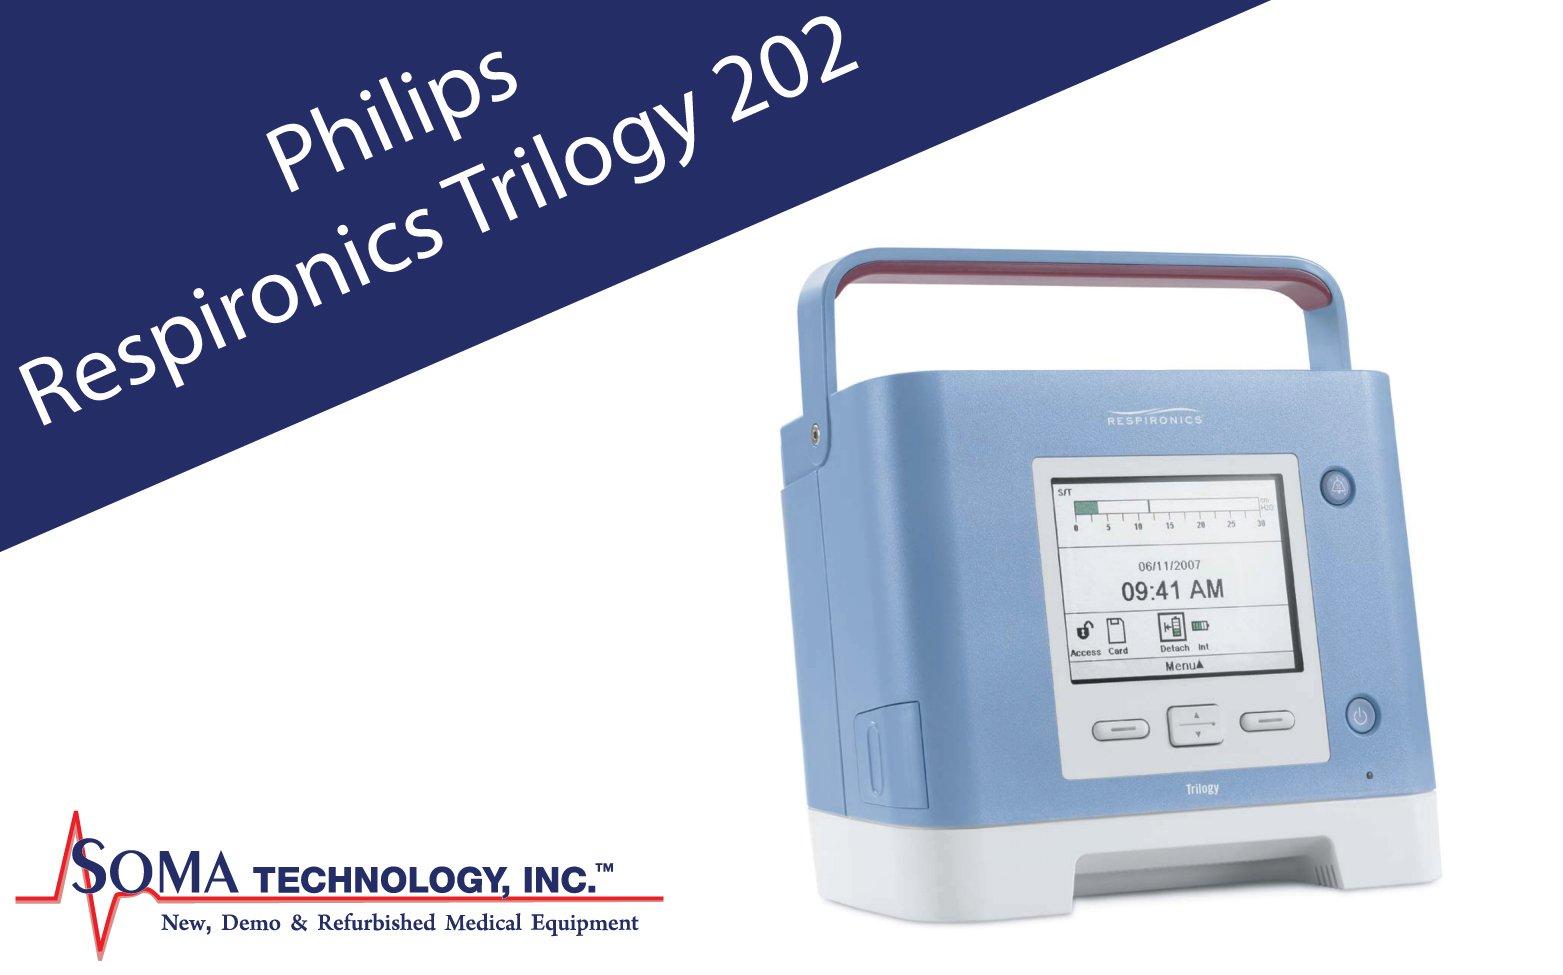 philips respironics bipap vision ventilator featuring epap rh somatechnology com BiPAP Machine Settings BiPAP Machine